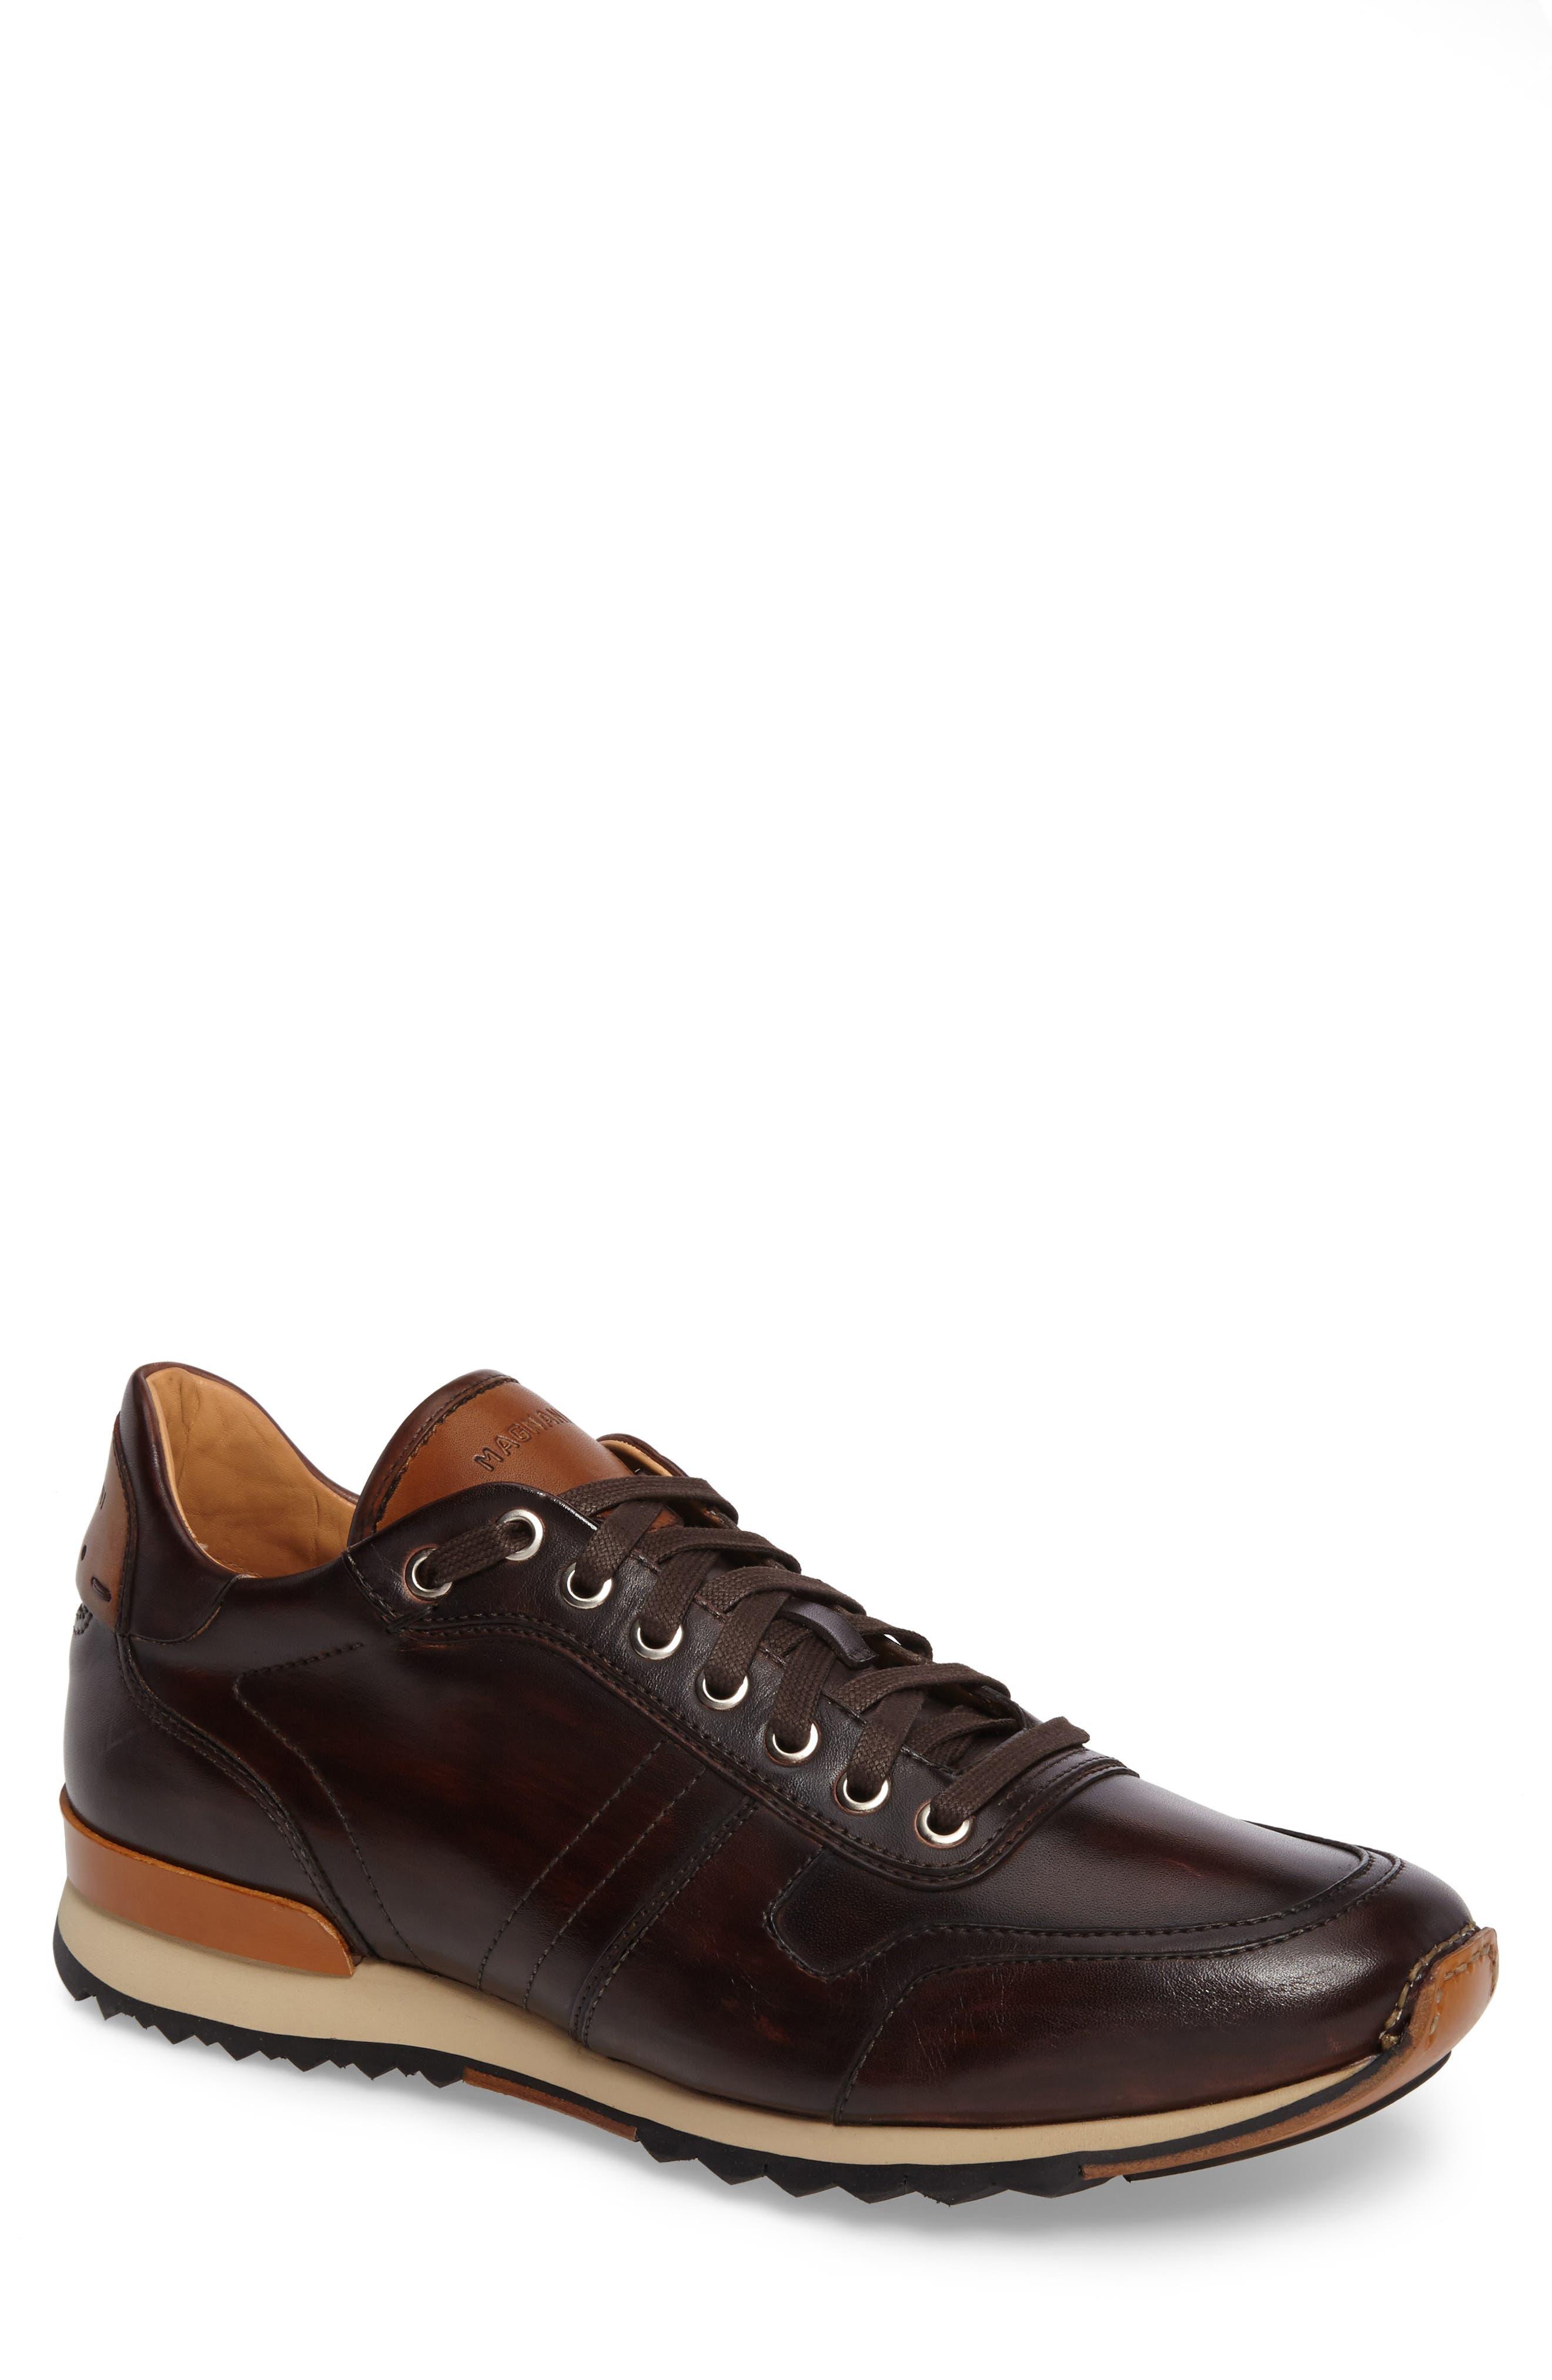 Alternate Image 1 Selected - Magnanni Galio Sneaker (Men)